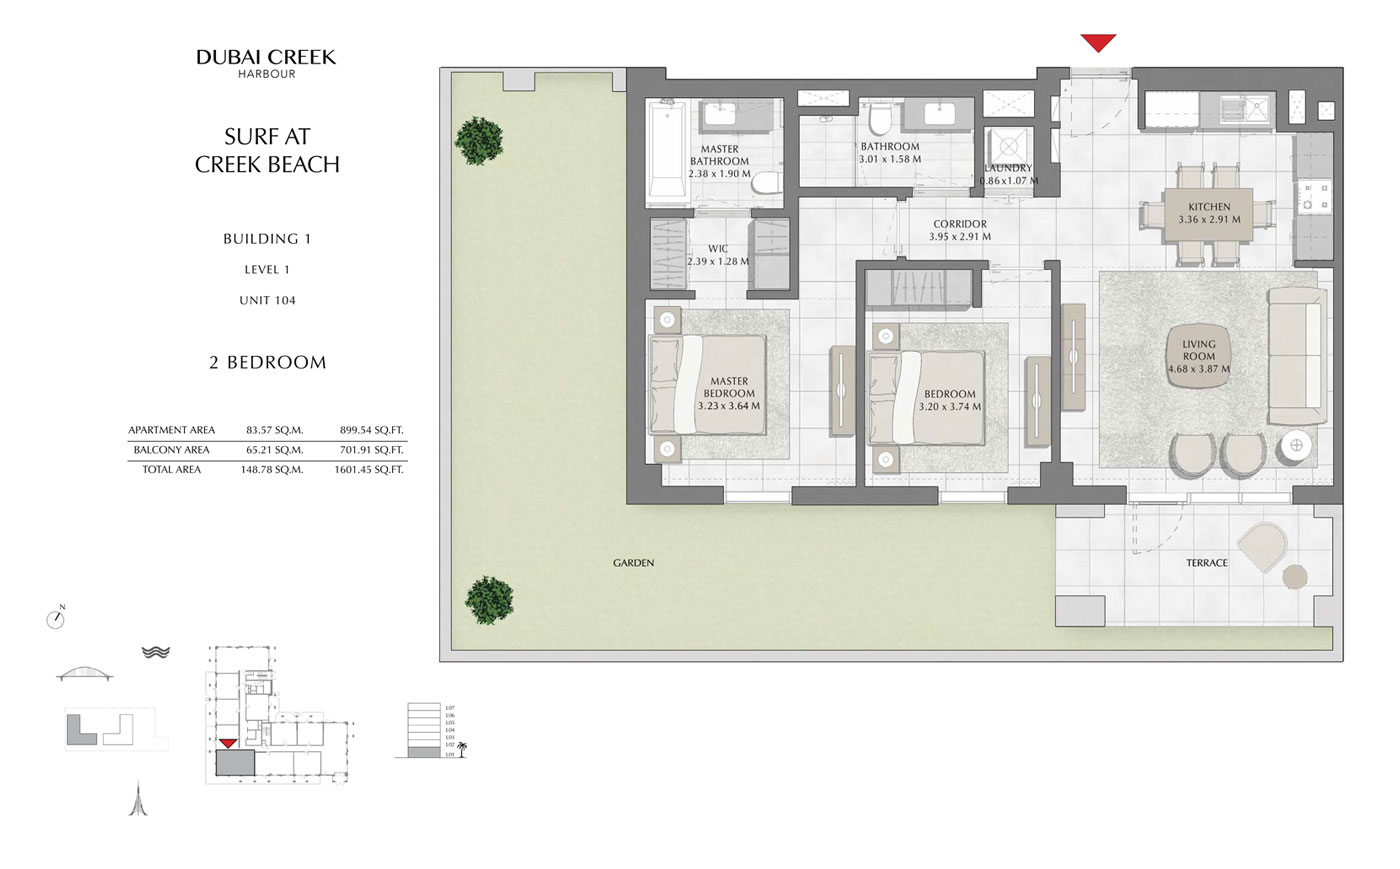 Building-1-2-Bedroom,-Level-1,-Unit-104,-Size-1601.45-sq-ft